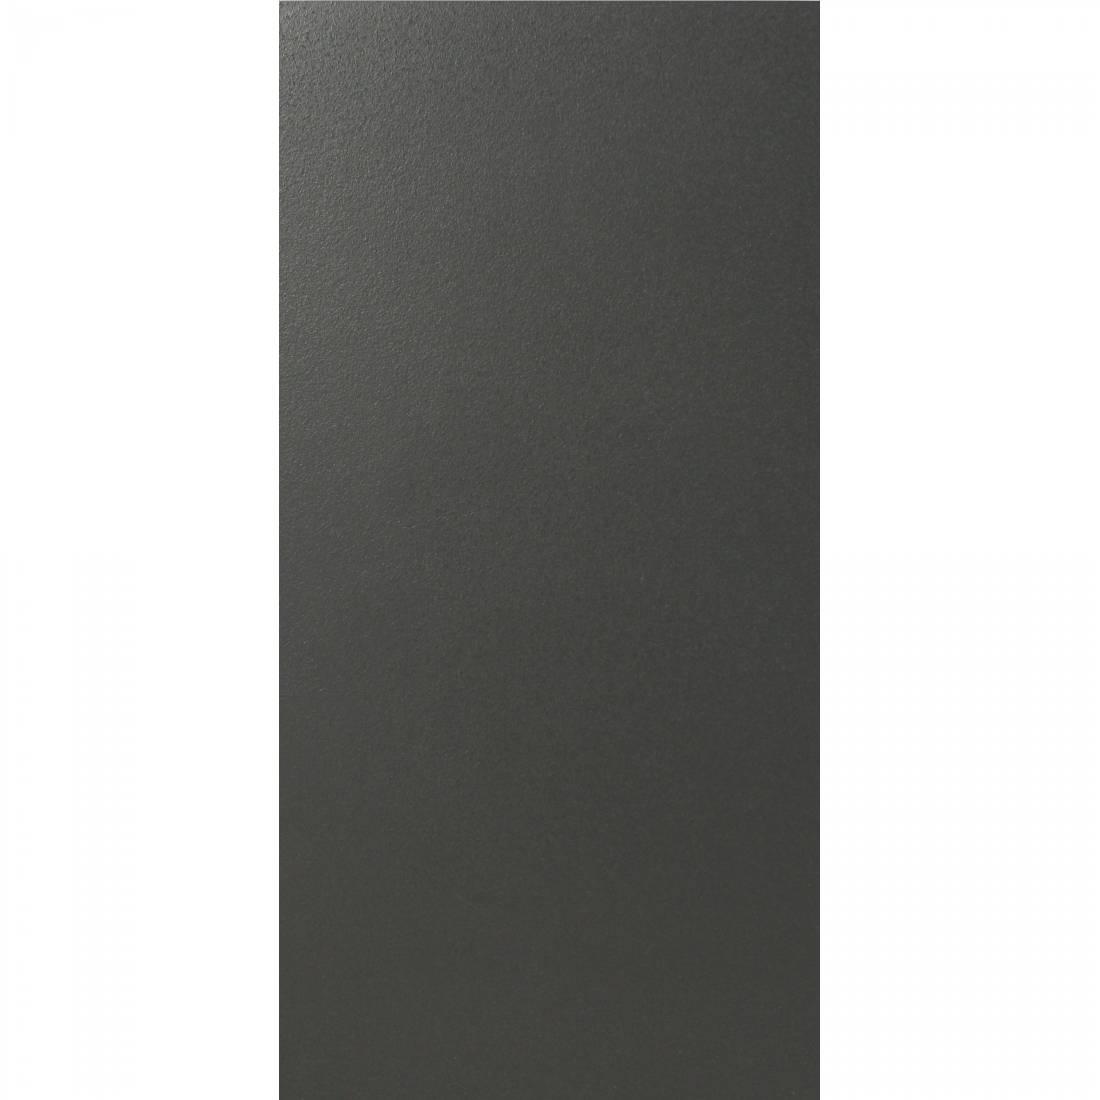 Crystal 30x60 Black 1